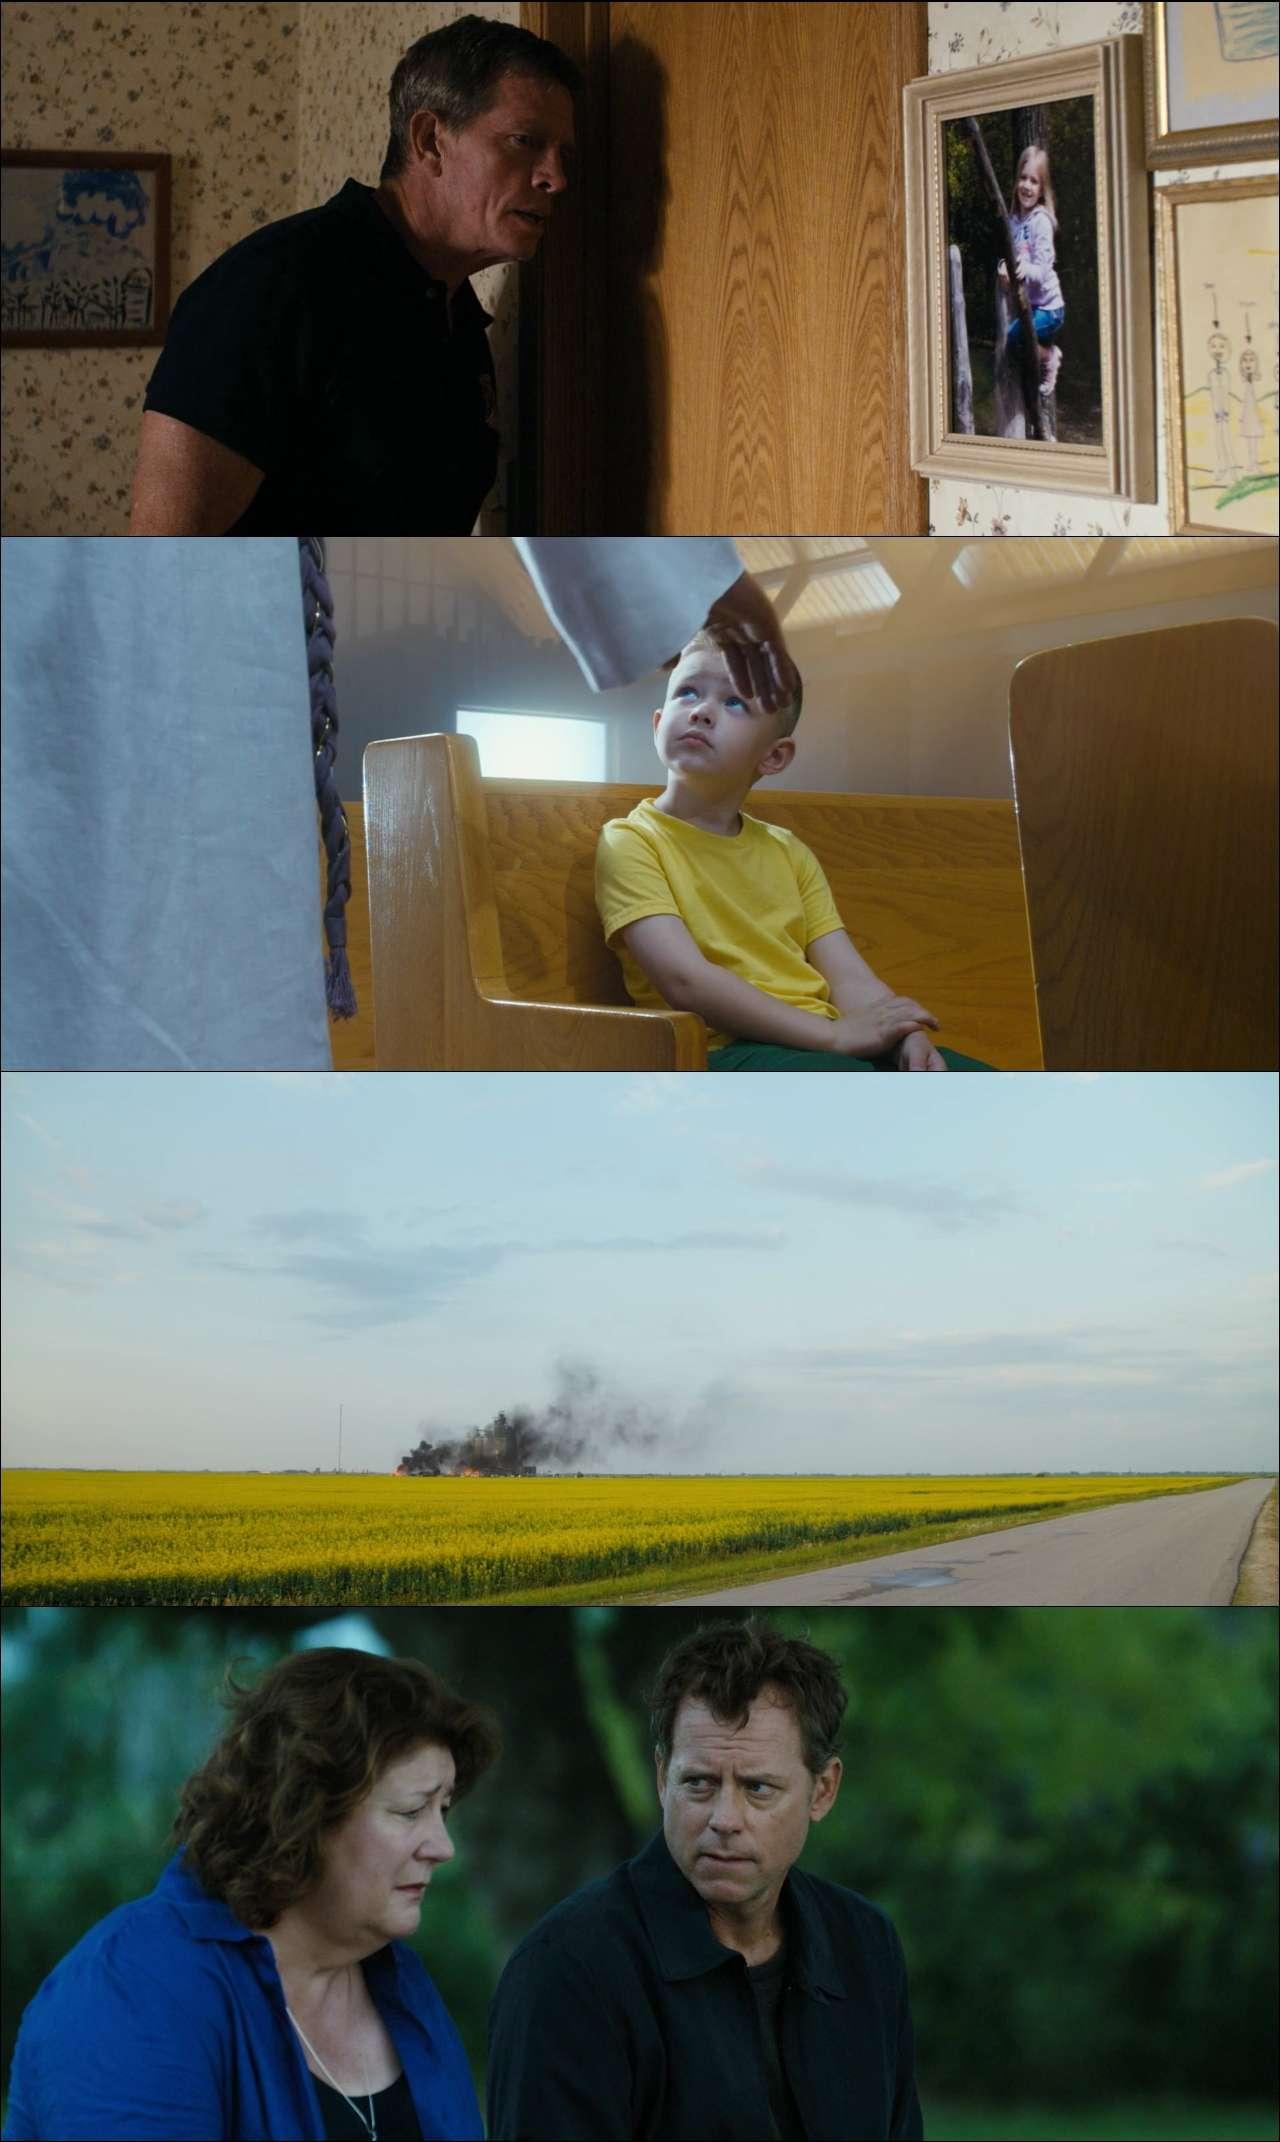 Gerçek Cennet - Heaven Is for Real (2014) türkçe dublaj film indir